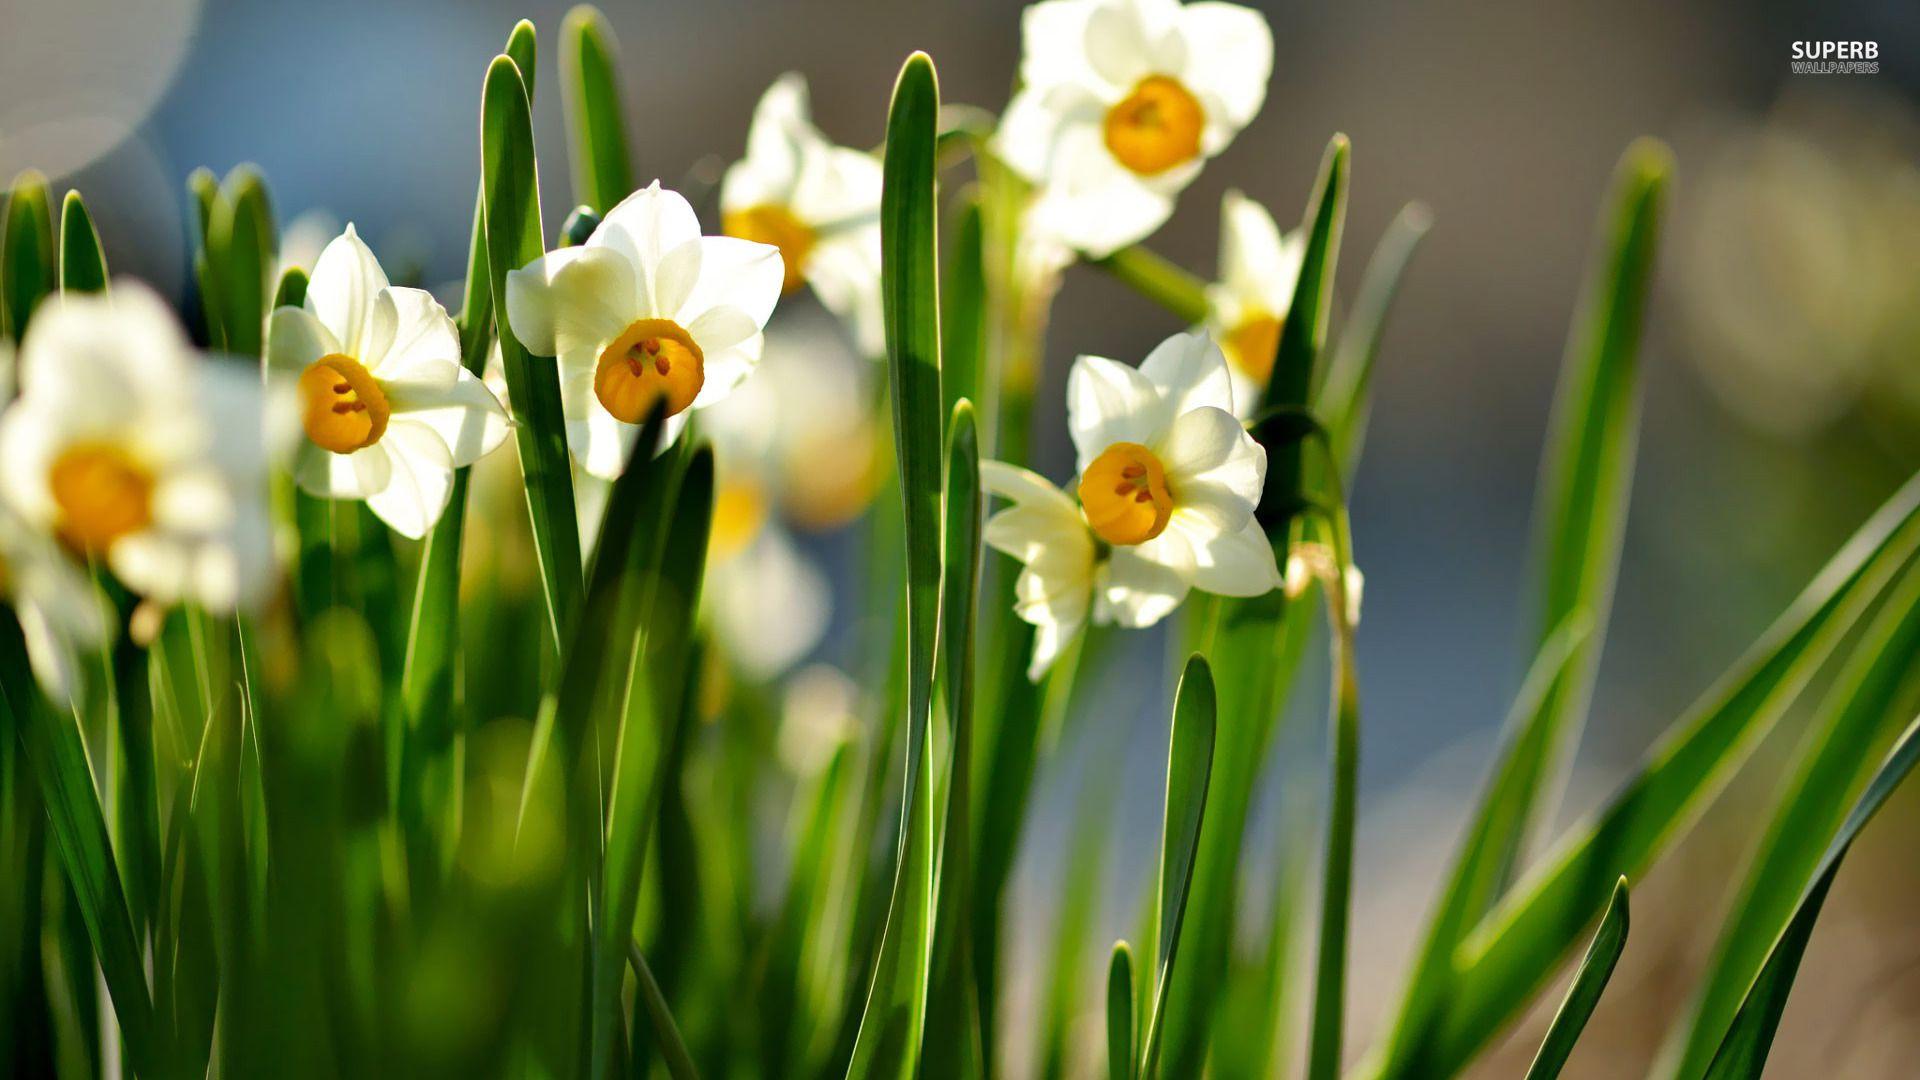 White daffodil flower background httpwhatstrendingonline white daffodil flower background httpwhatstrendingonlinewhite daffodil mightylinksfo